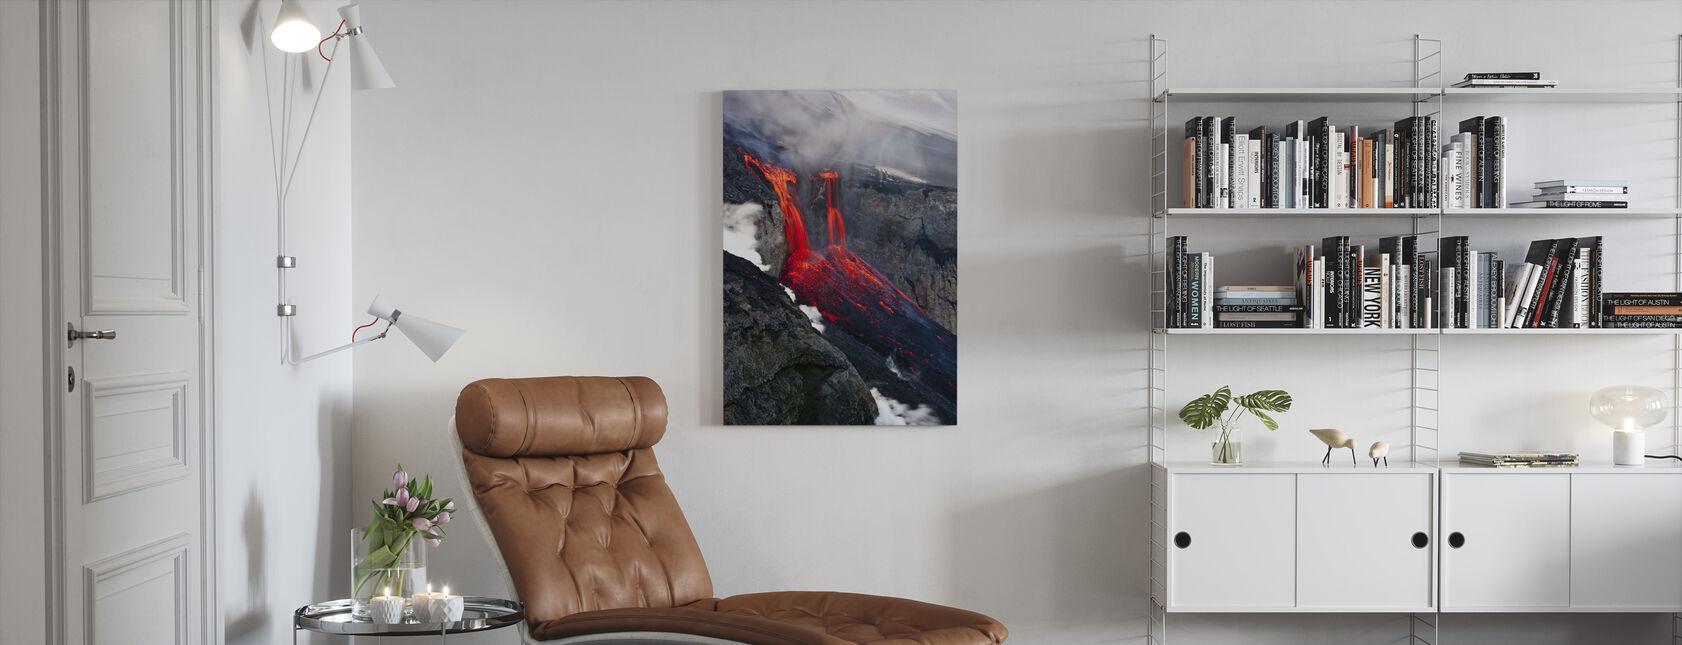 Flytande eld - Canvastavla - Vardagsrum